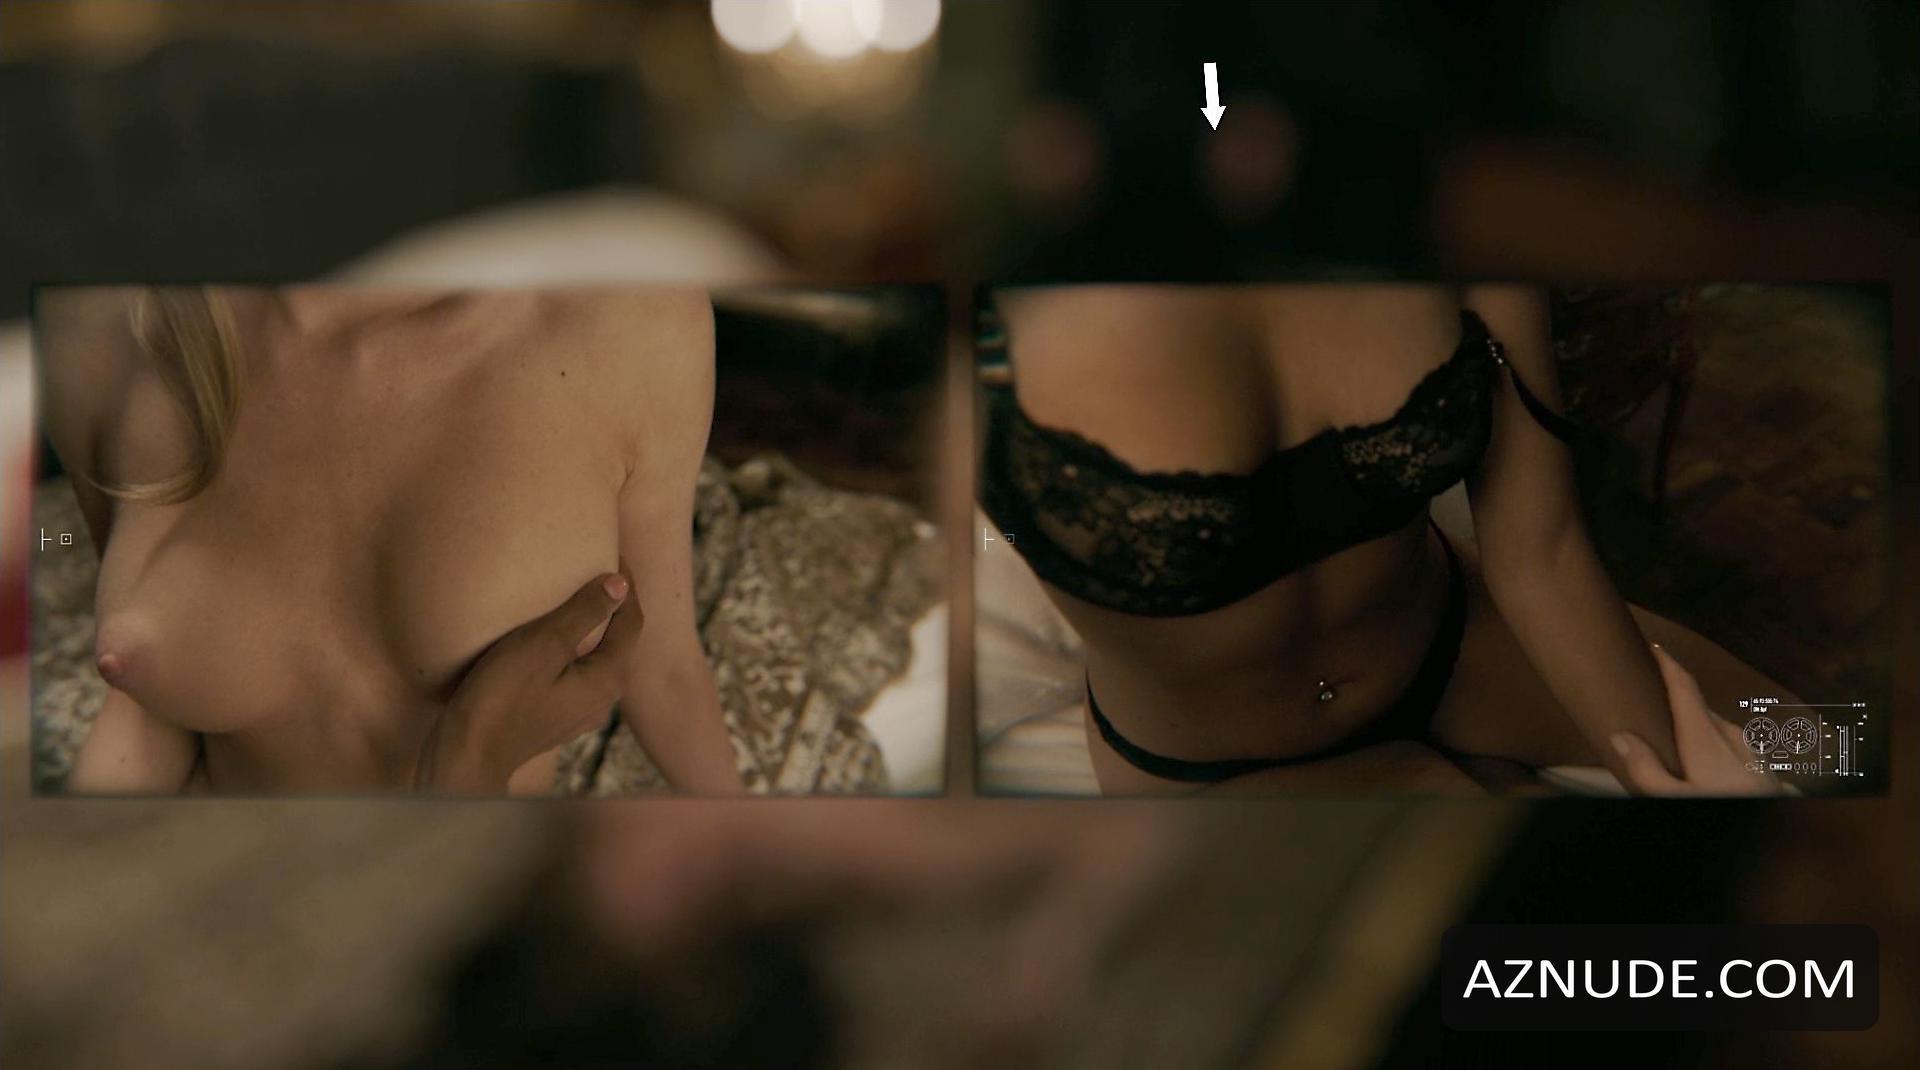 Celeb Jessica Sierra Nude Pics Pic